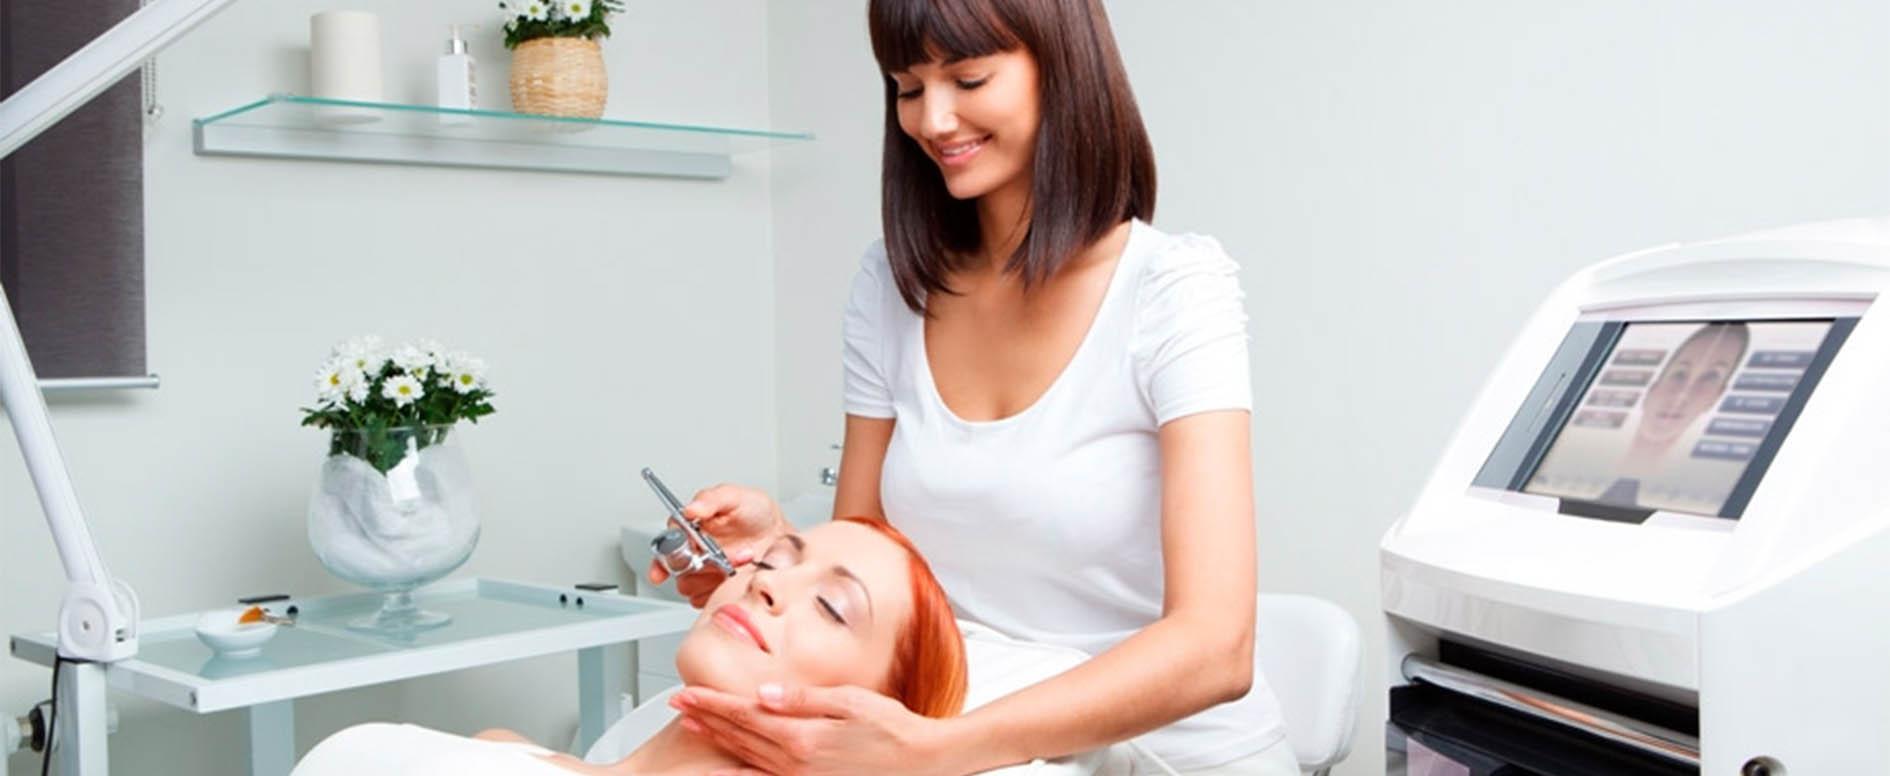 Косметолог - описание профессии косметолога | Обязанности, зарплата и где  учиться на косметолога